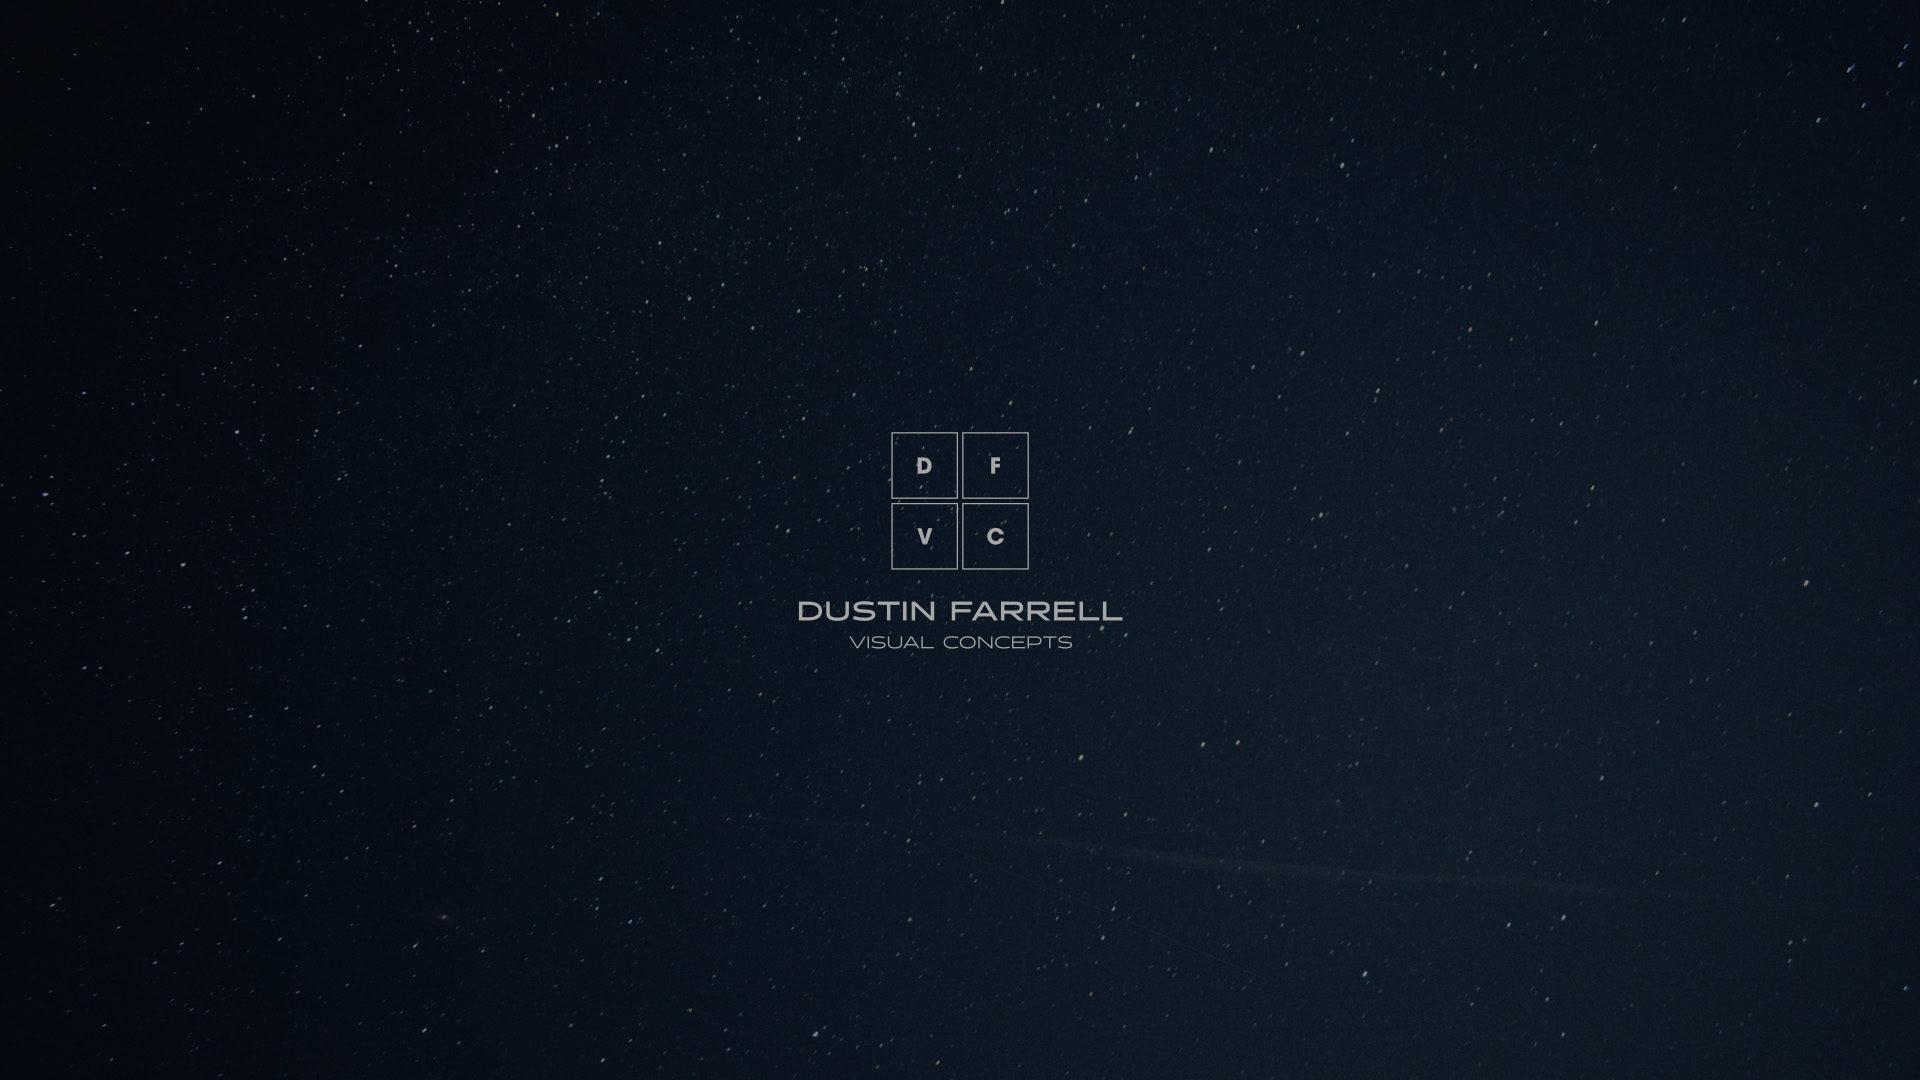 Dustin Farrell Website Design and Development